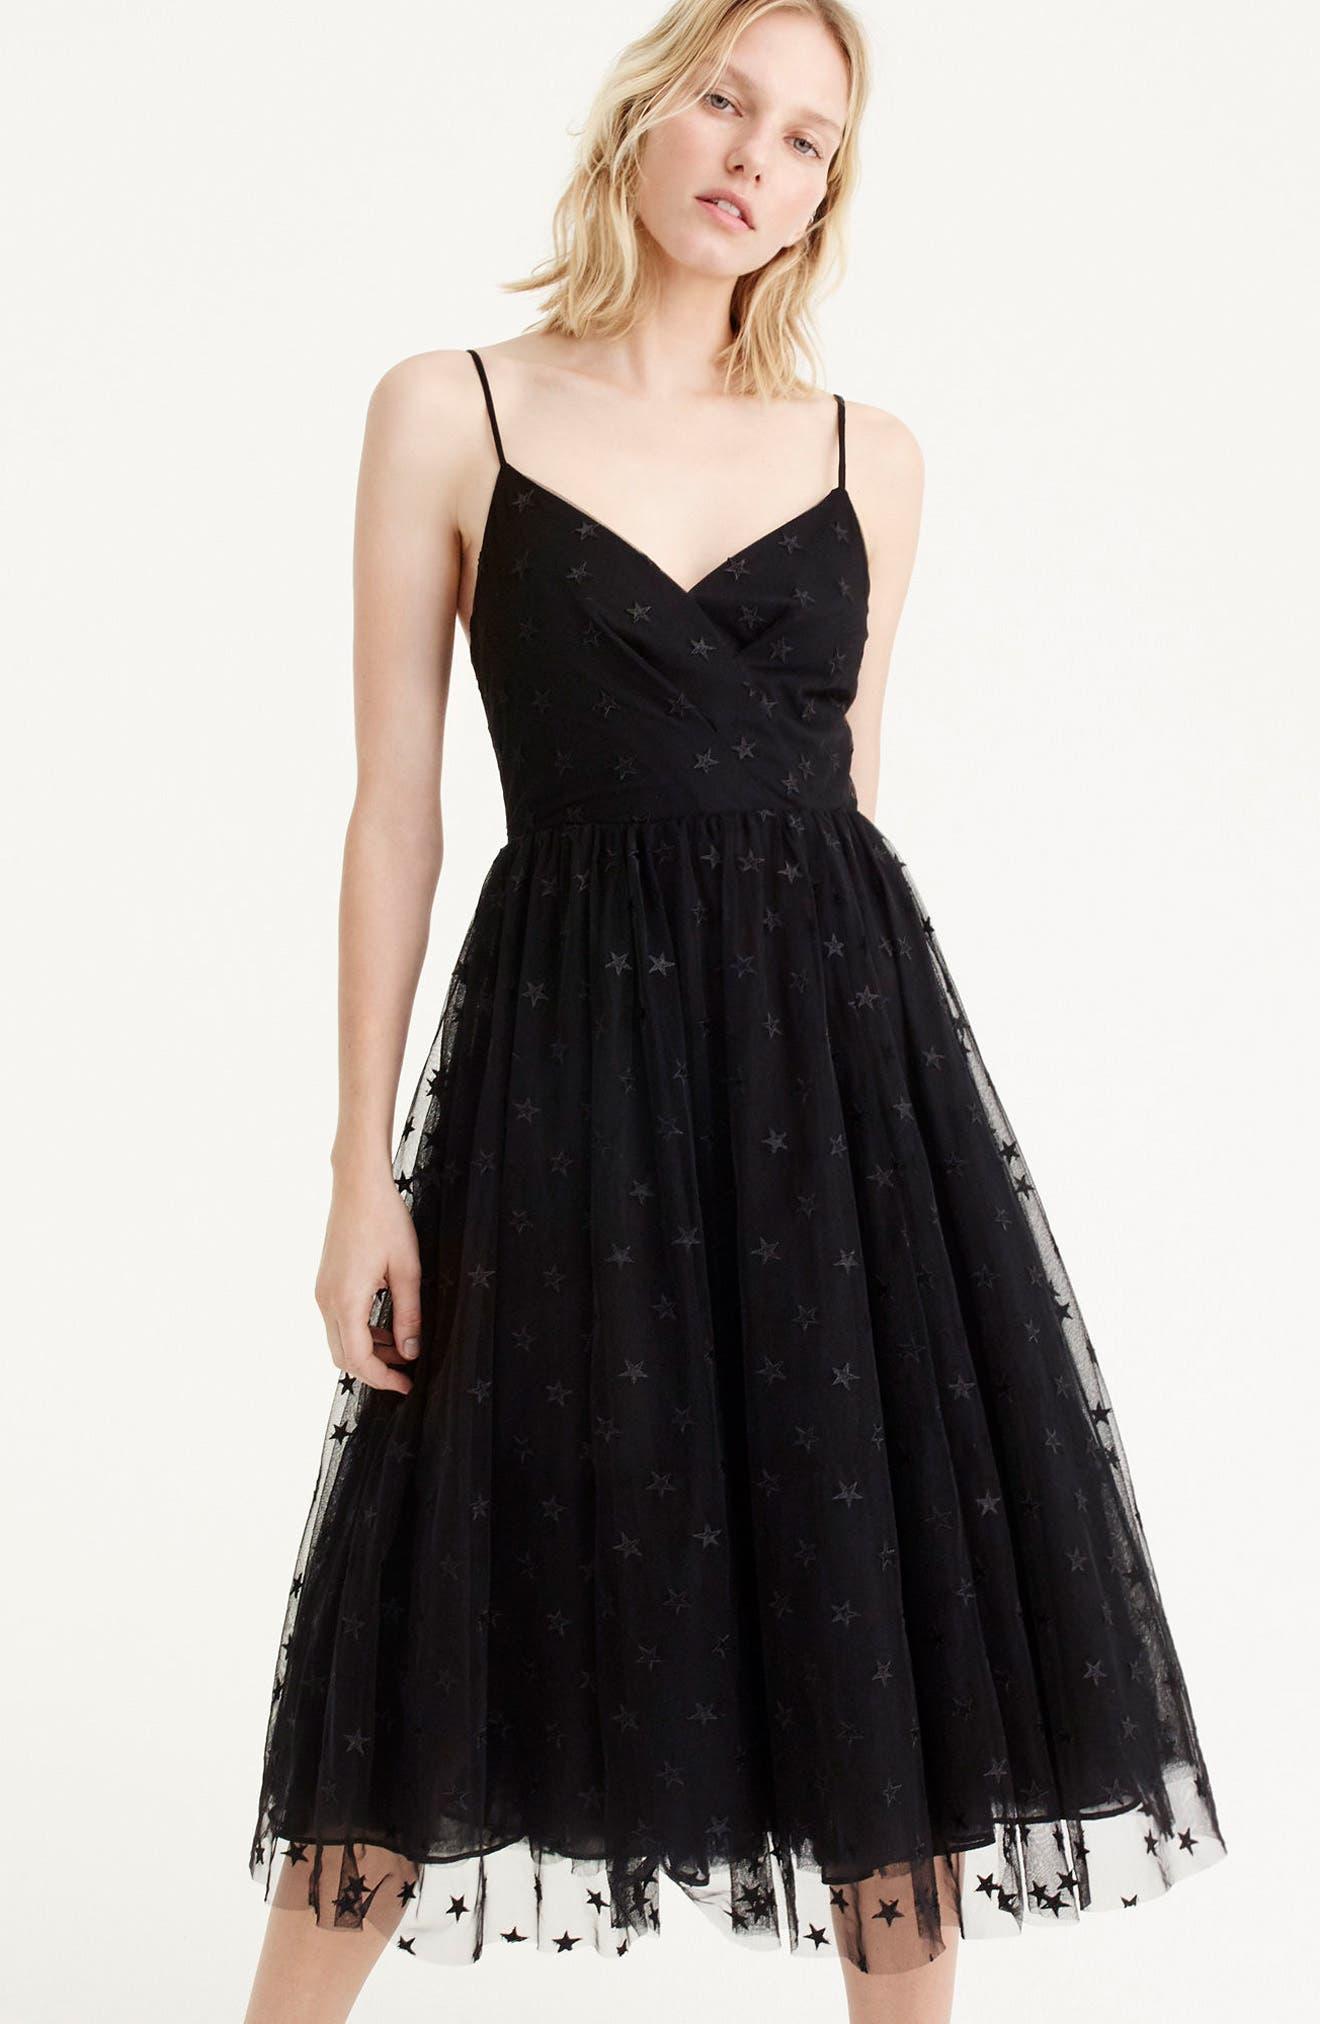 J.Crew Spaghetti Strap Star Tulle Dress,                             Alternate thumbnail 3, color,                             Black